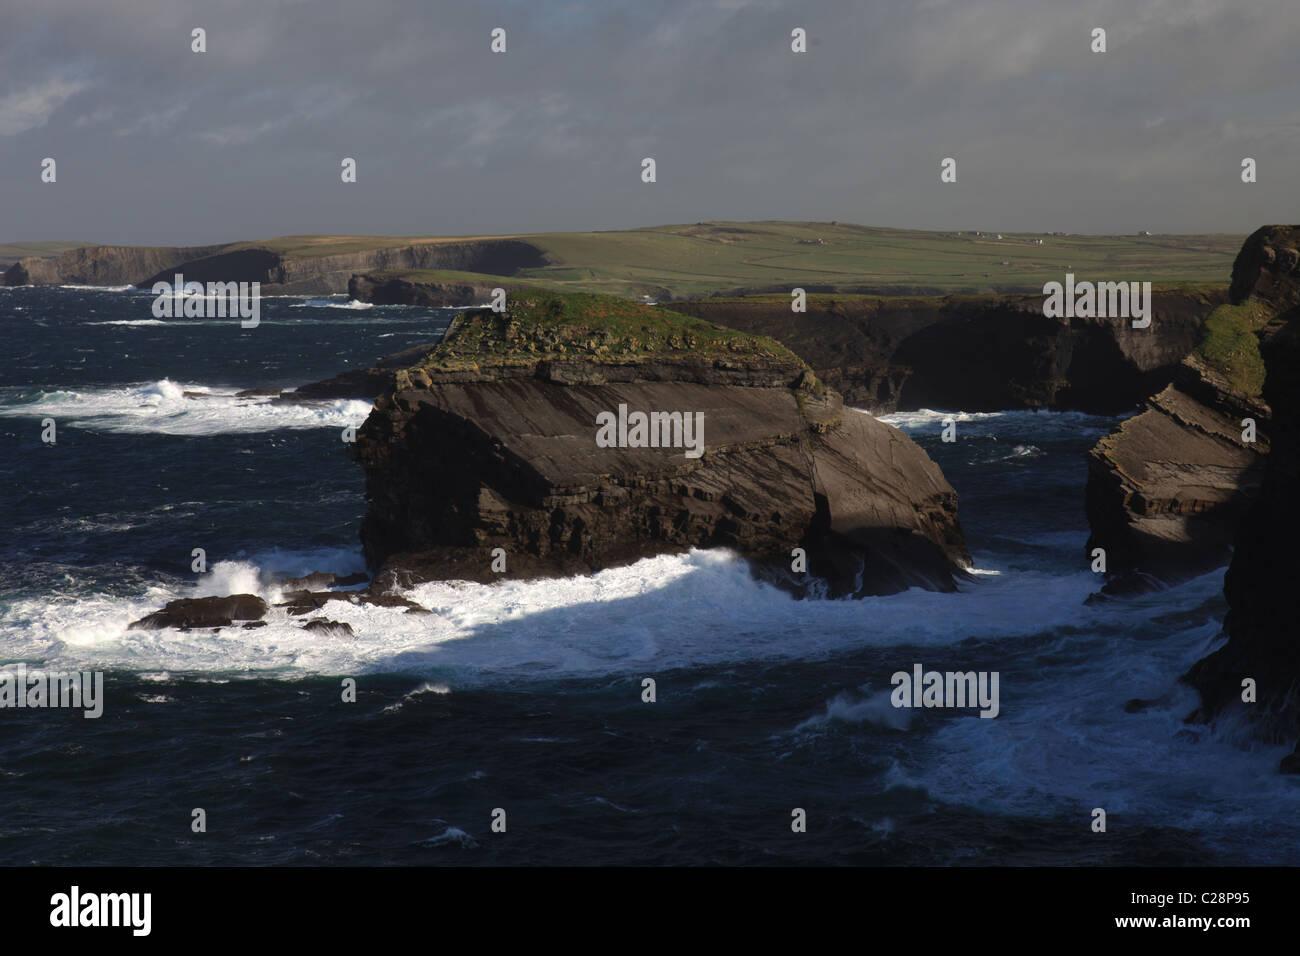 ireland county  clare, atlantic sea waves crashing onto irish landmass, beauty in nature, wild atlantic way, - Stock Image